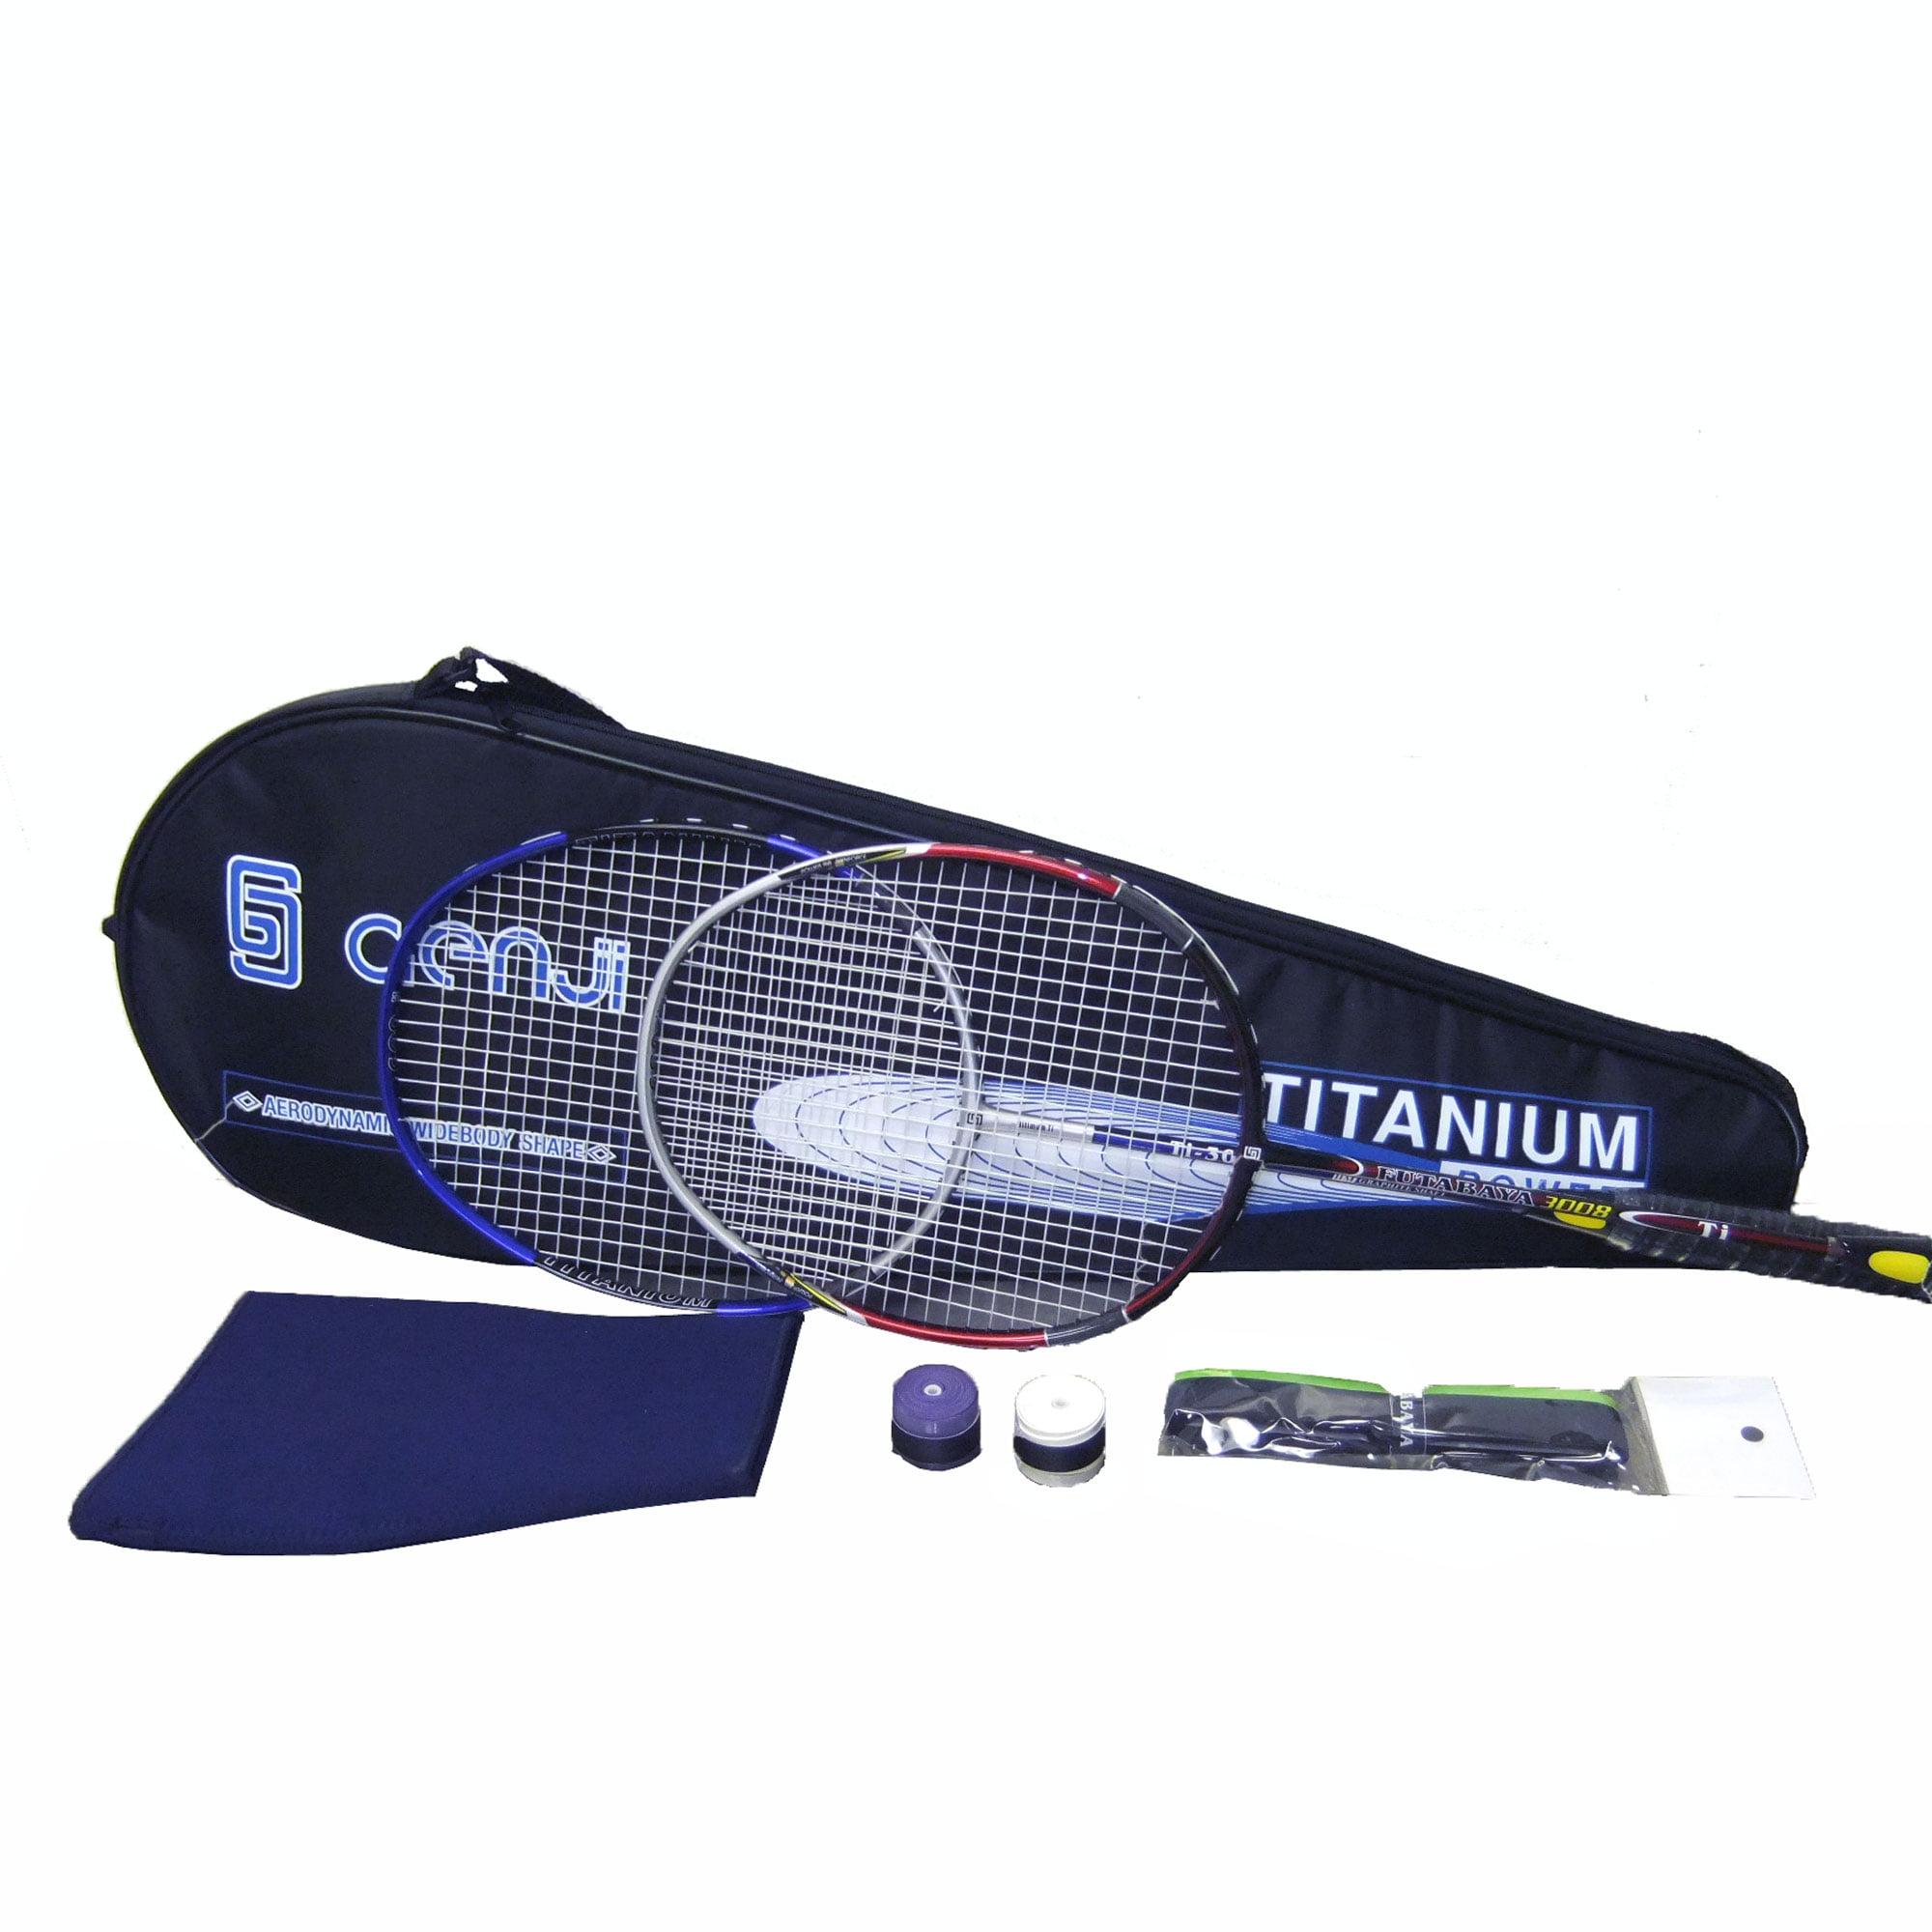 Genji Sports Titanium Badminton Rackets Set